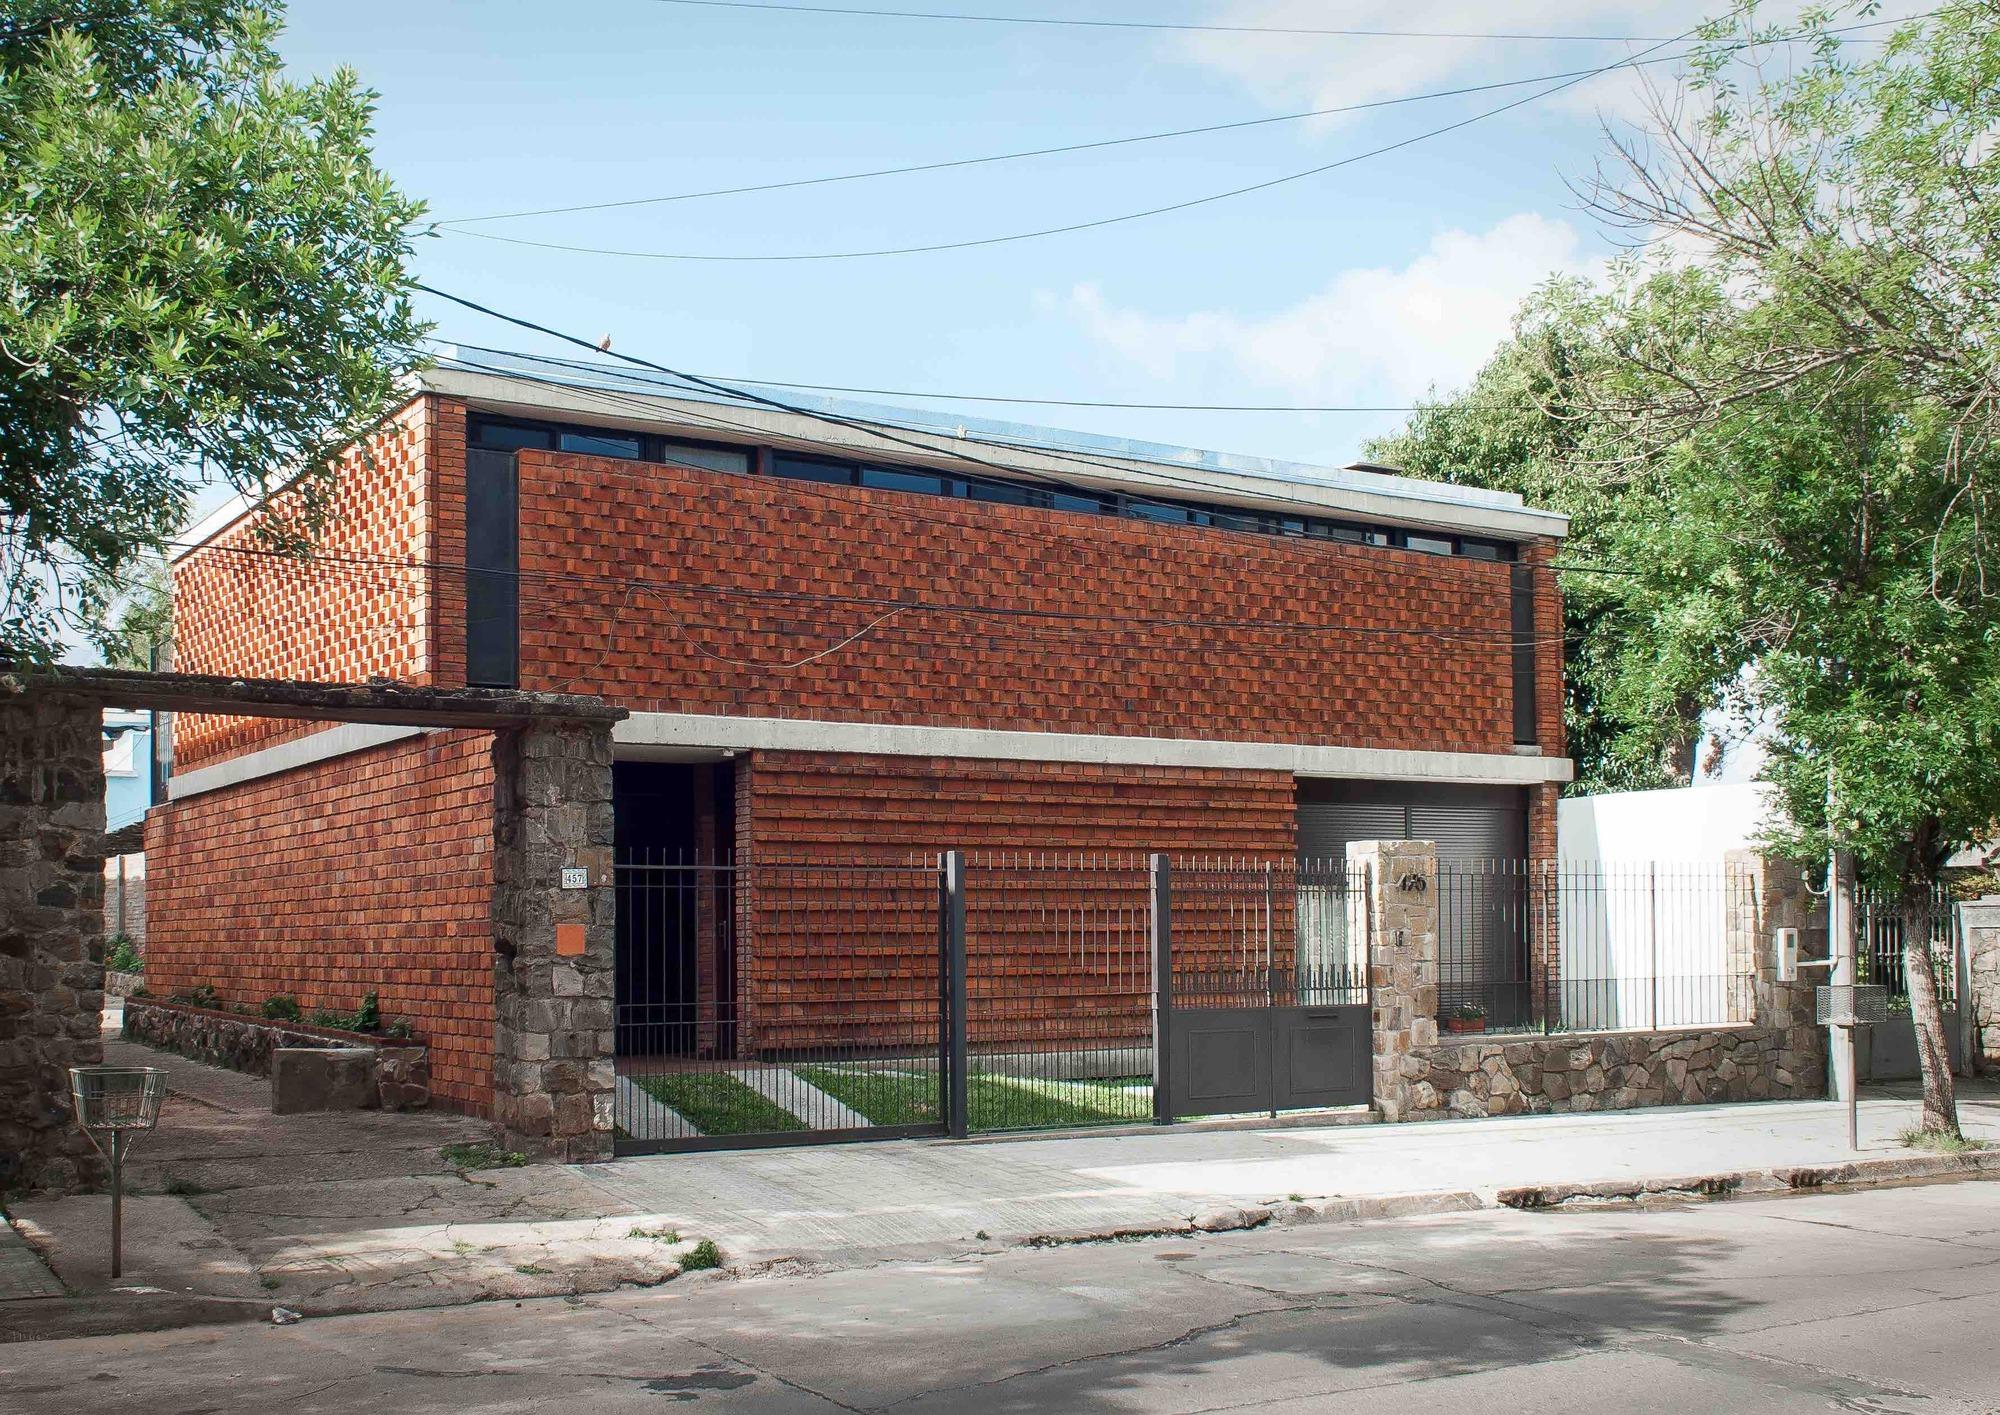 Gallery of casa de ladrillo paulo ambrosoni 10 - Construccion de chimeneas de ladrillo ...